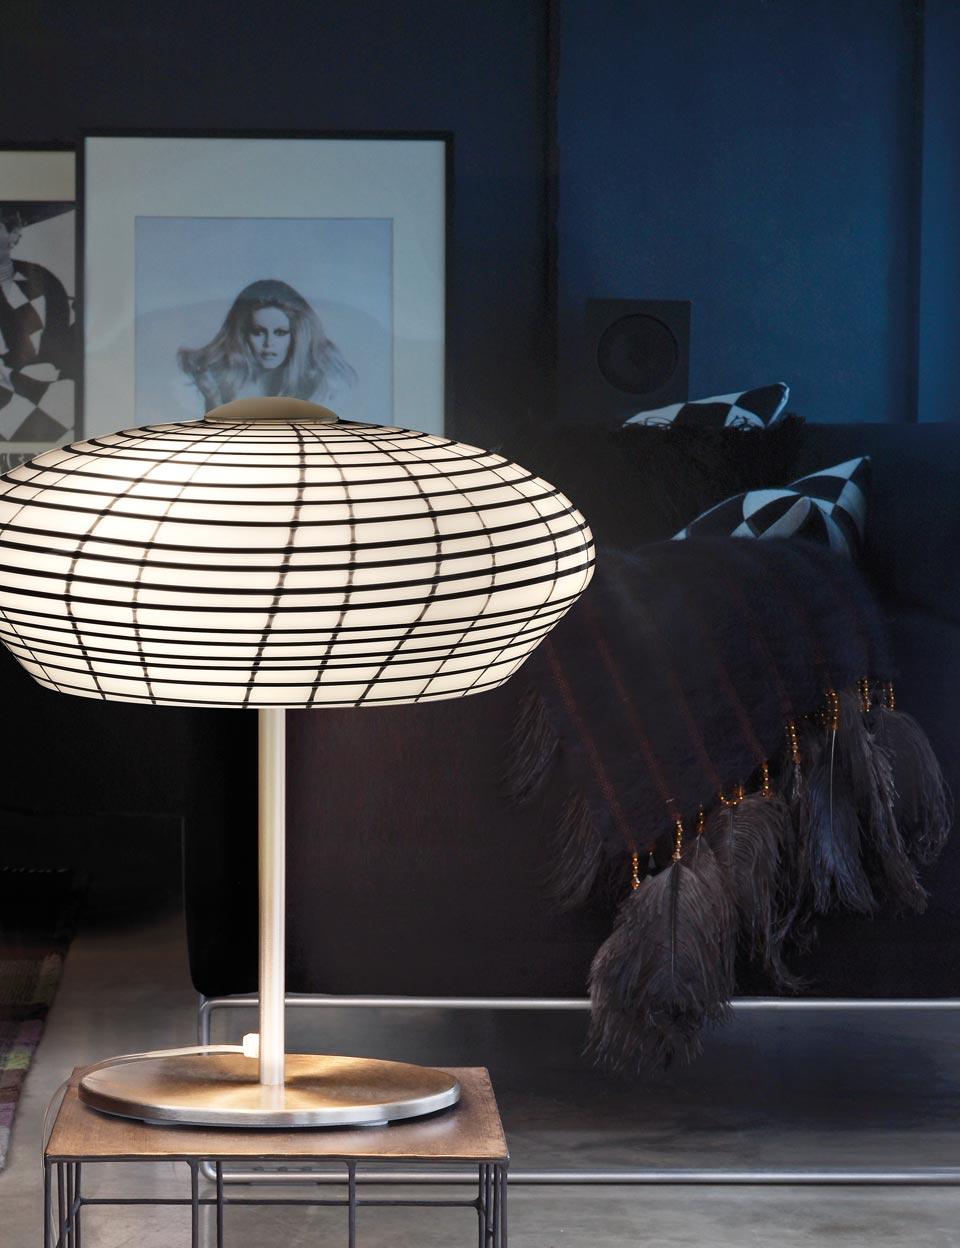 Lampe de table Yuba en cristal de Murano blanc et noir. Vistosi.